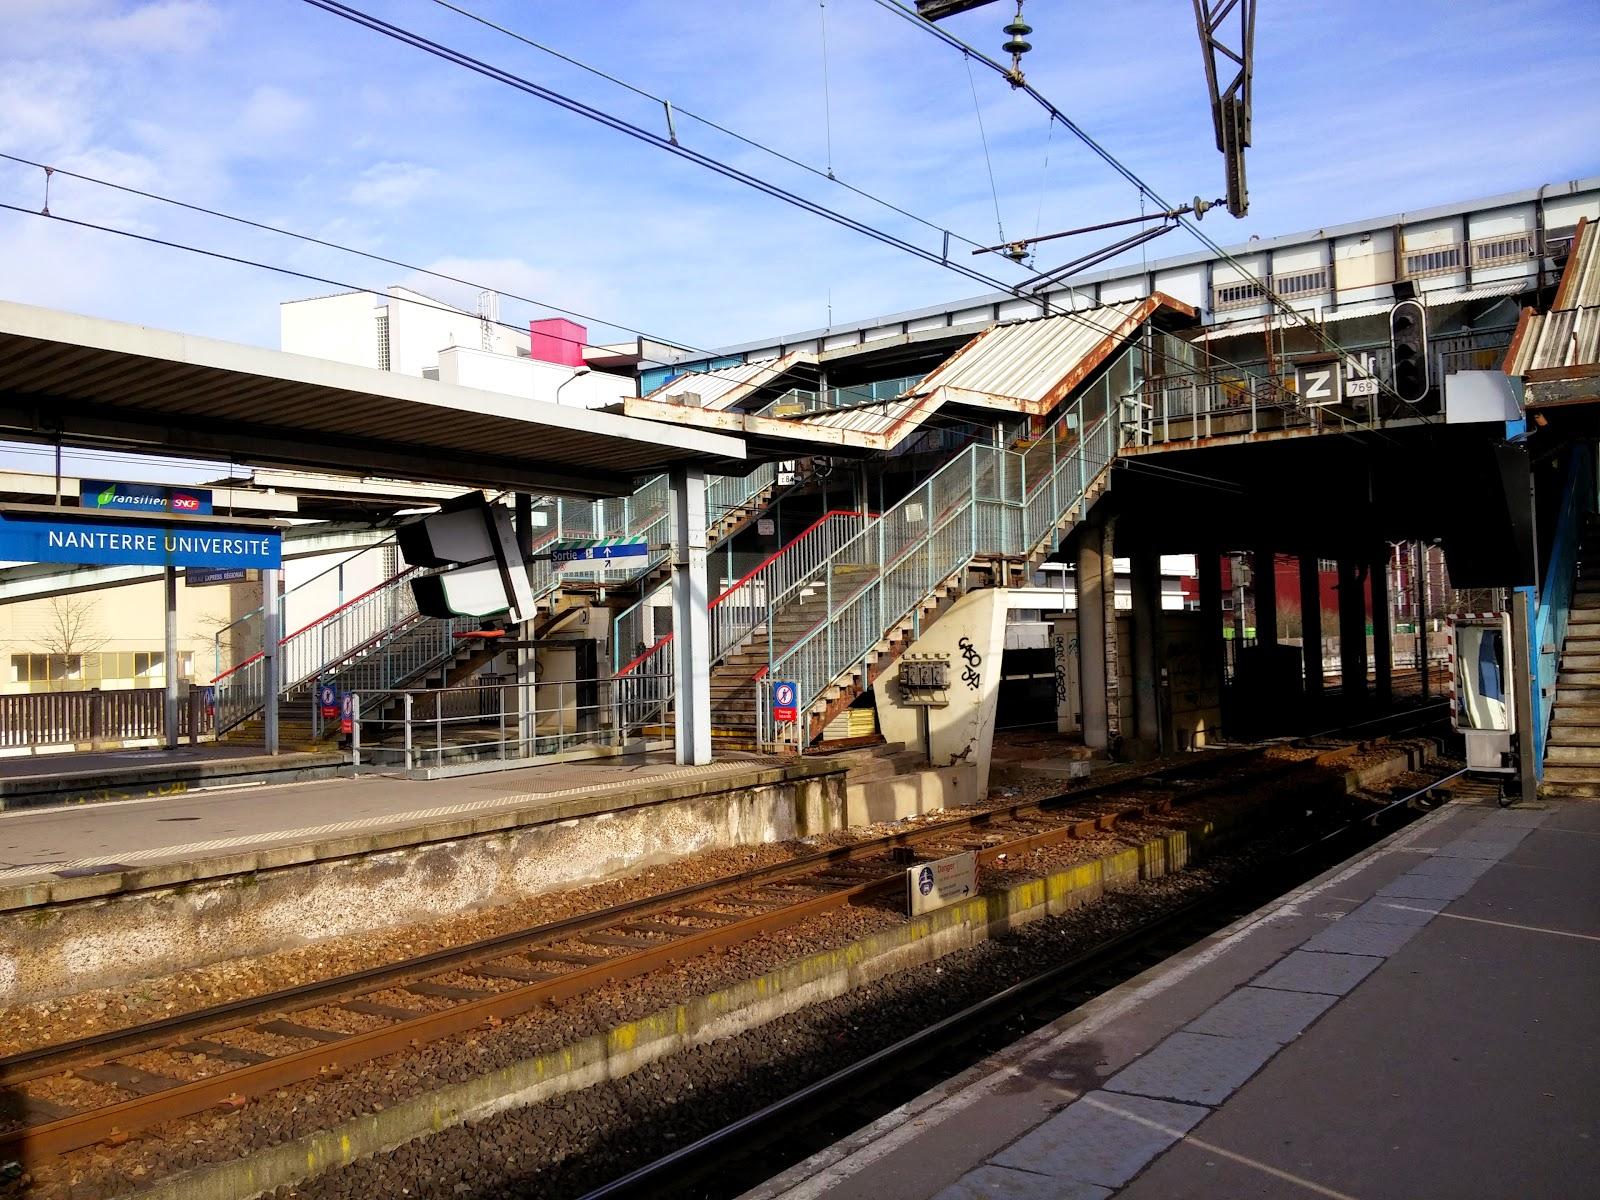 La ville de nanterre vue autrement la future gare - Piscine nanterre universite ...